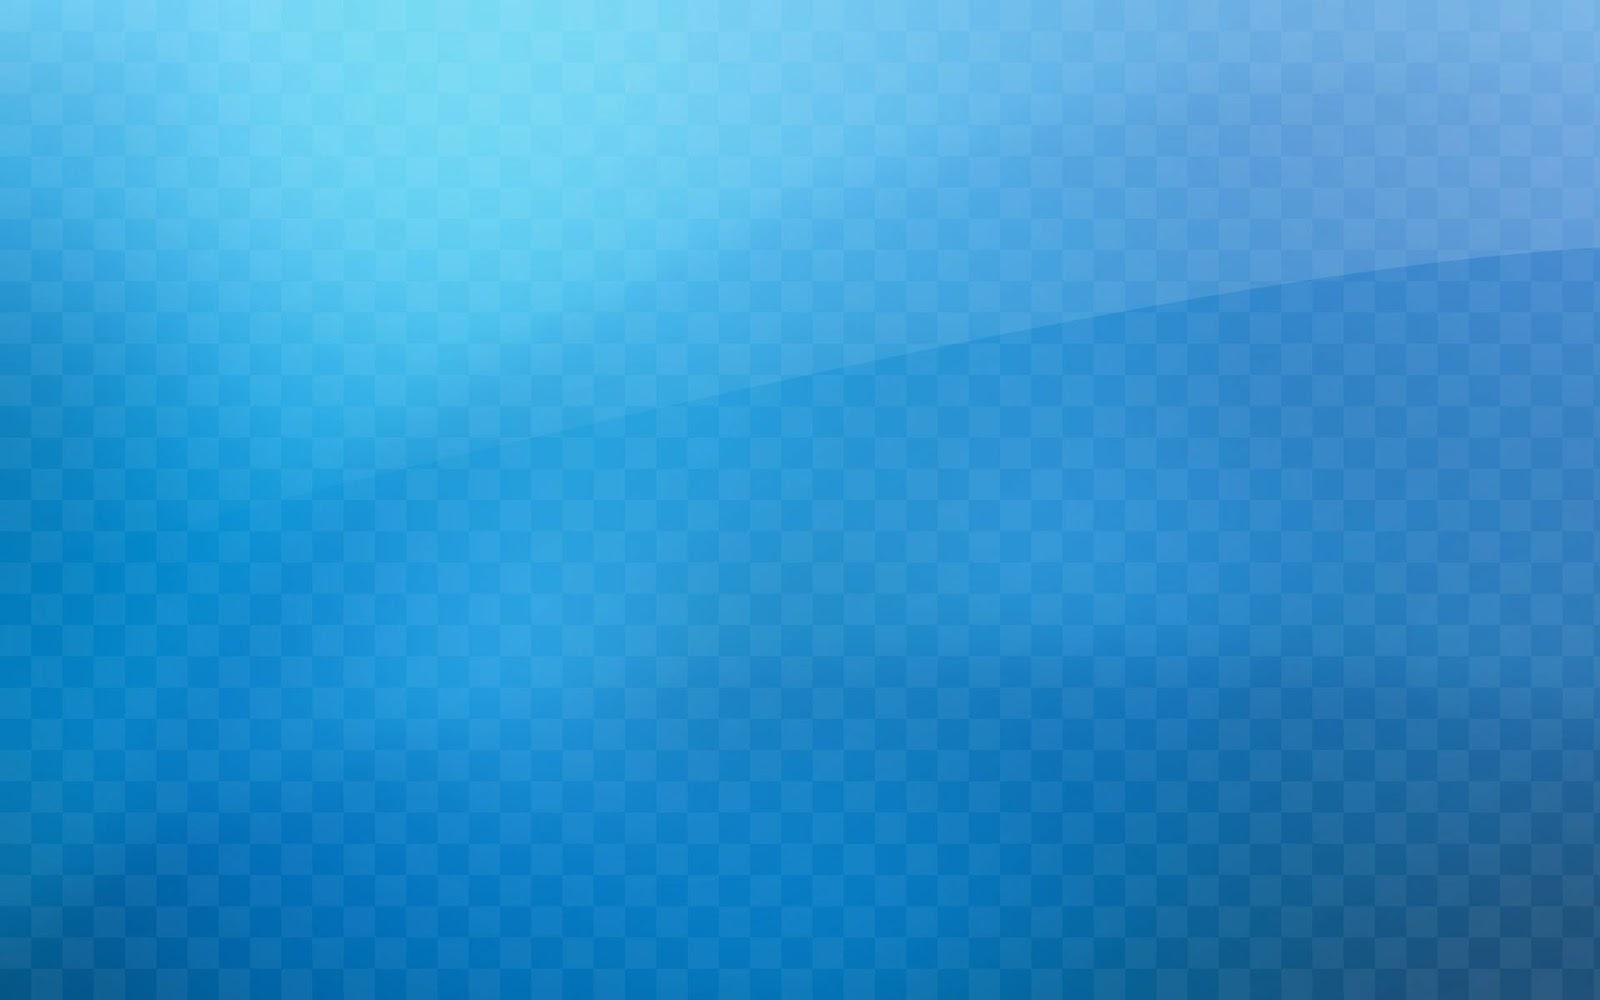 Imagenes Hilandy: Fondo De Pantalla Abstracto Textura Azul HD